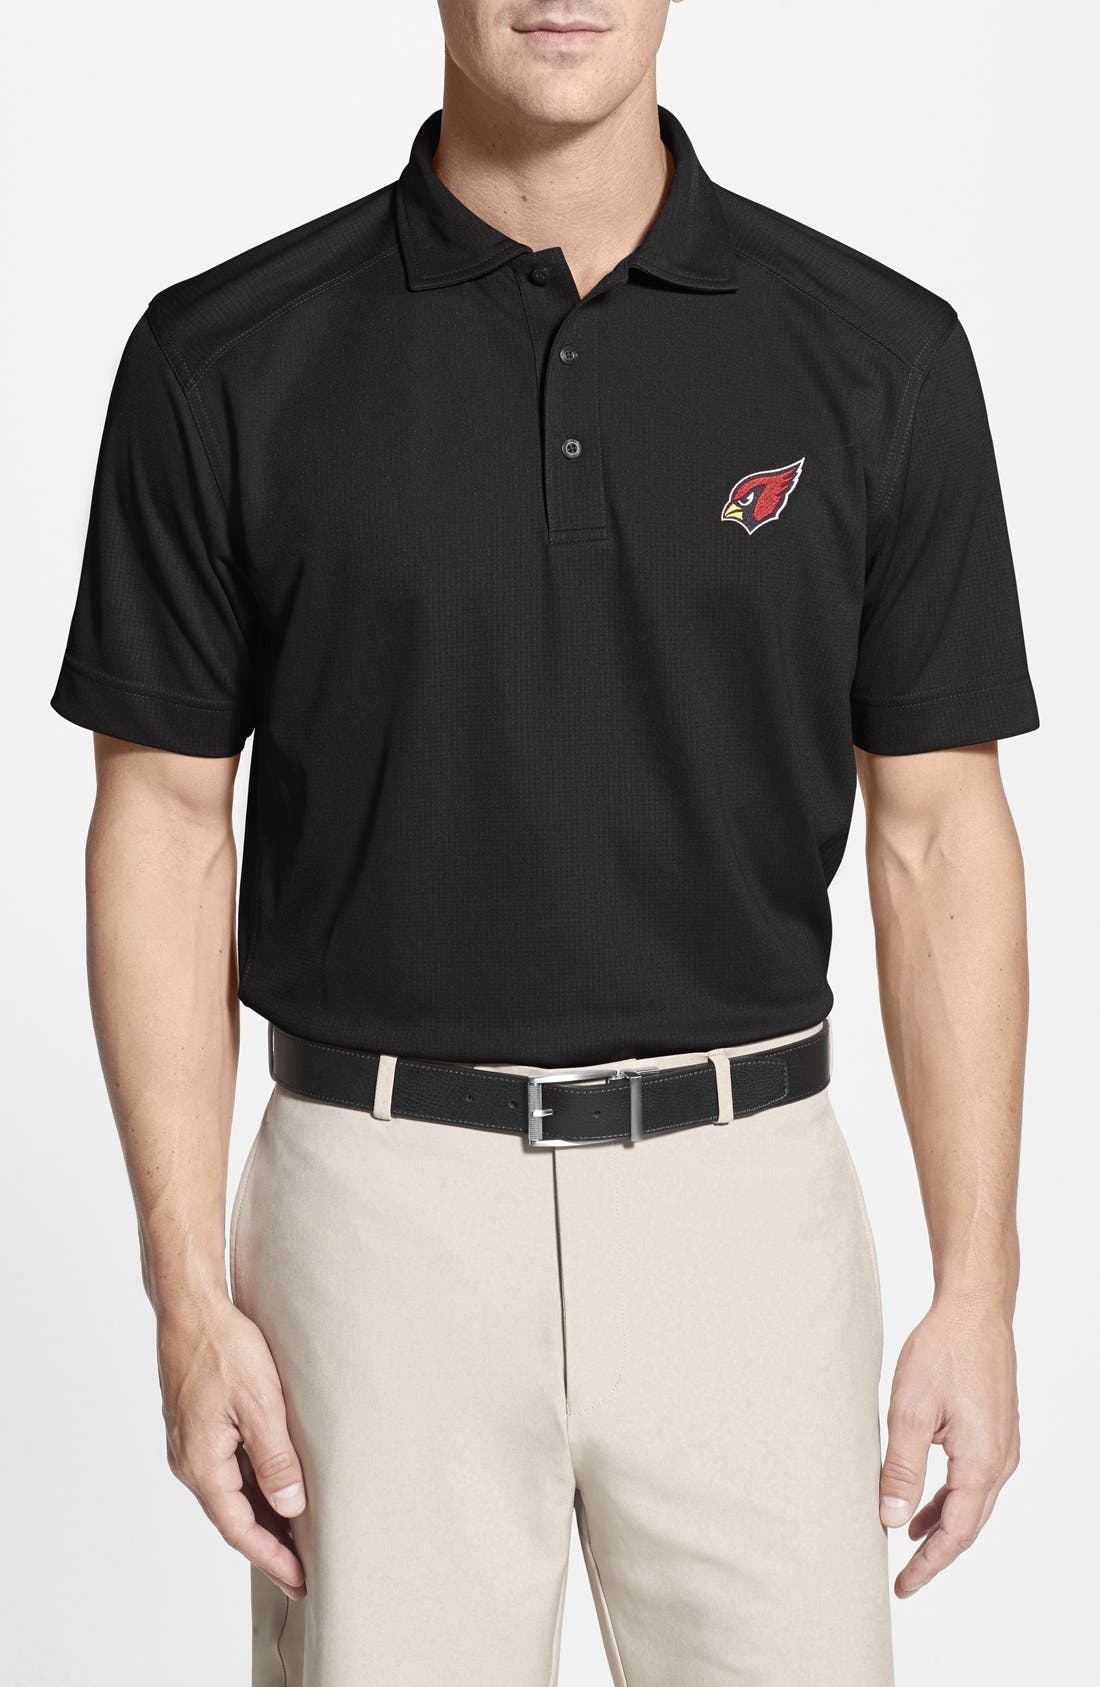 Arizona Cardinals - Genre DryTec Moisture Wicking Polo,                             Main thumbnail 1, color,                             001